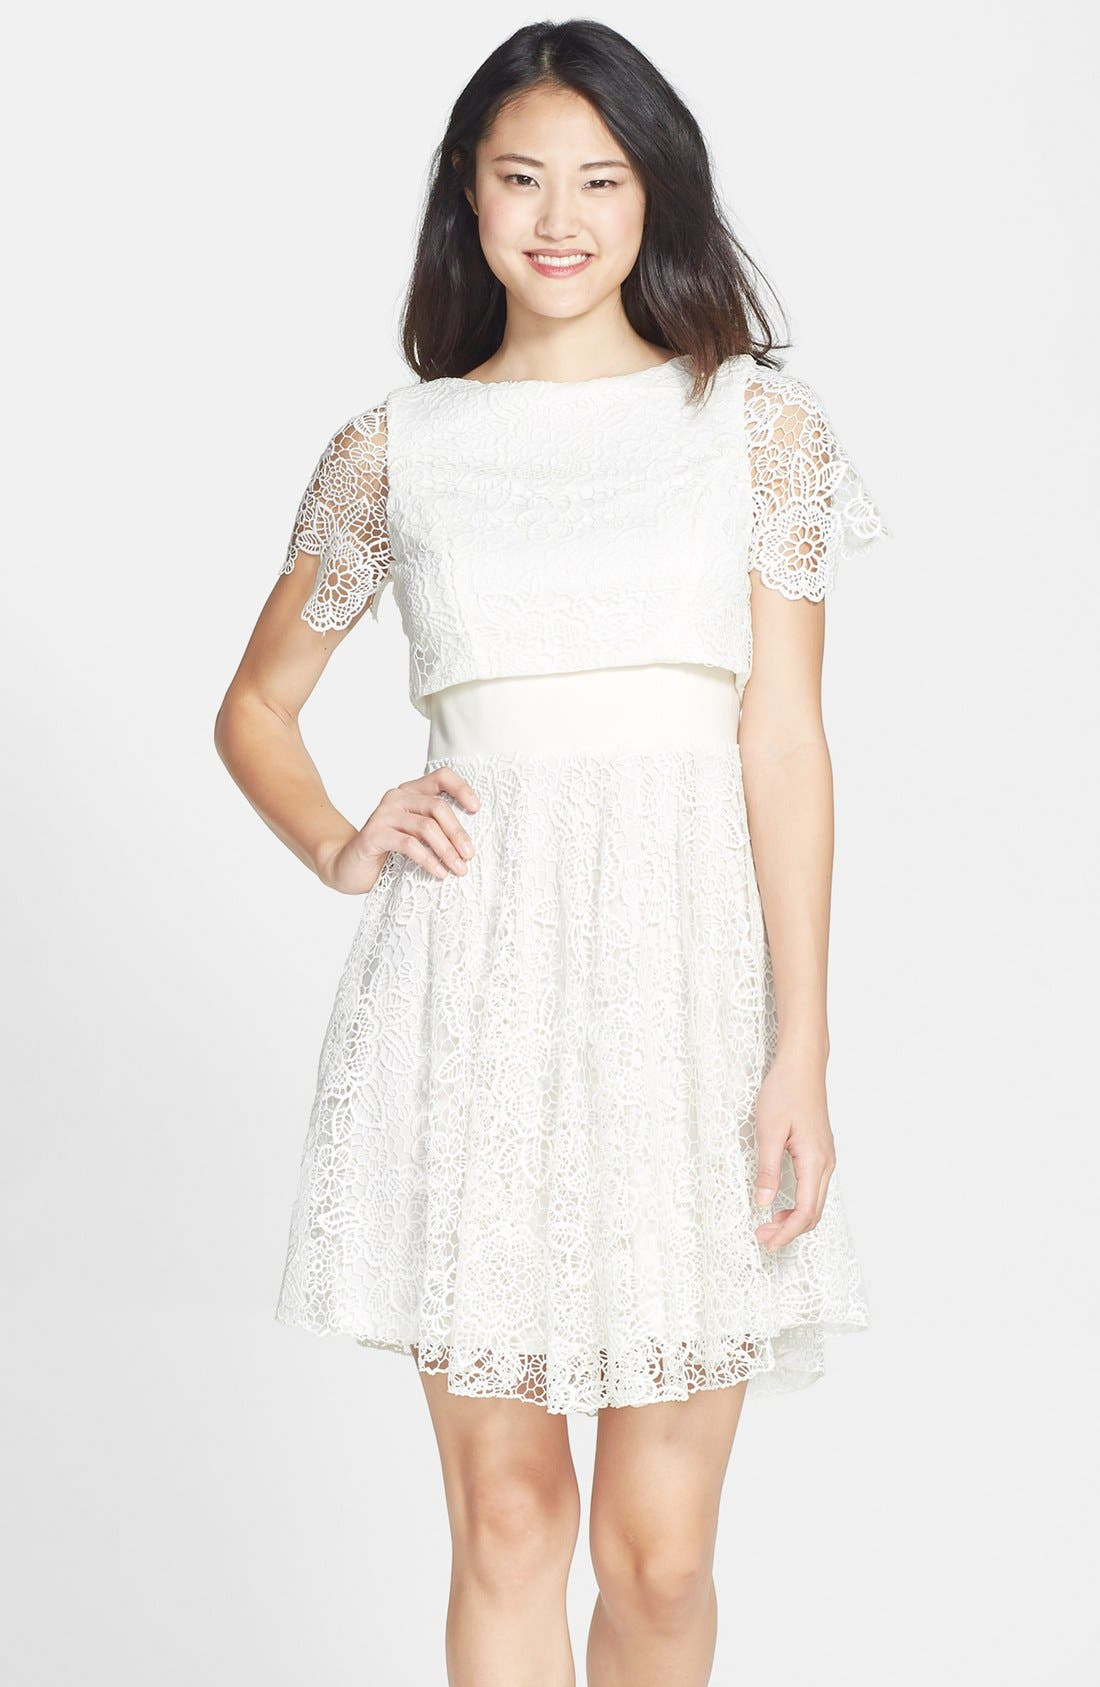 EVA FRANCO 'Mira' Lace & Crepe Popover Dress, Main, color, 100